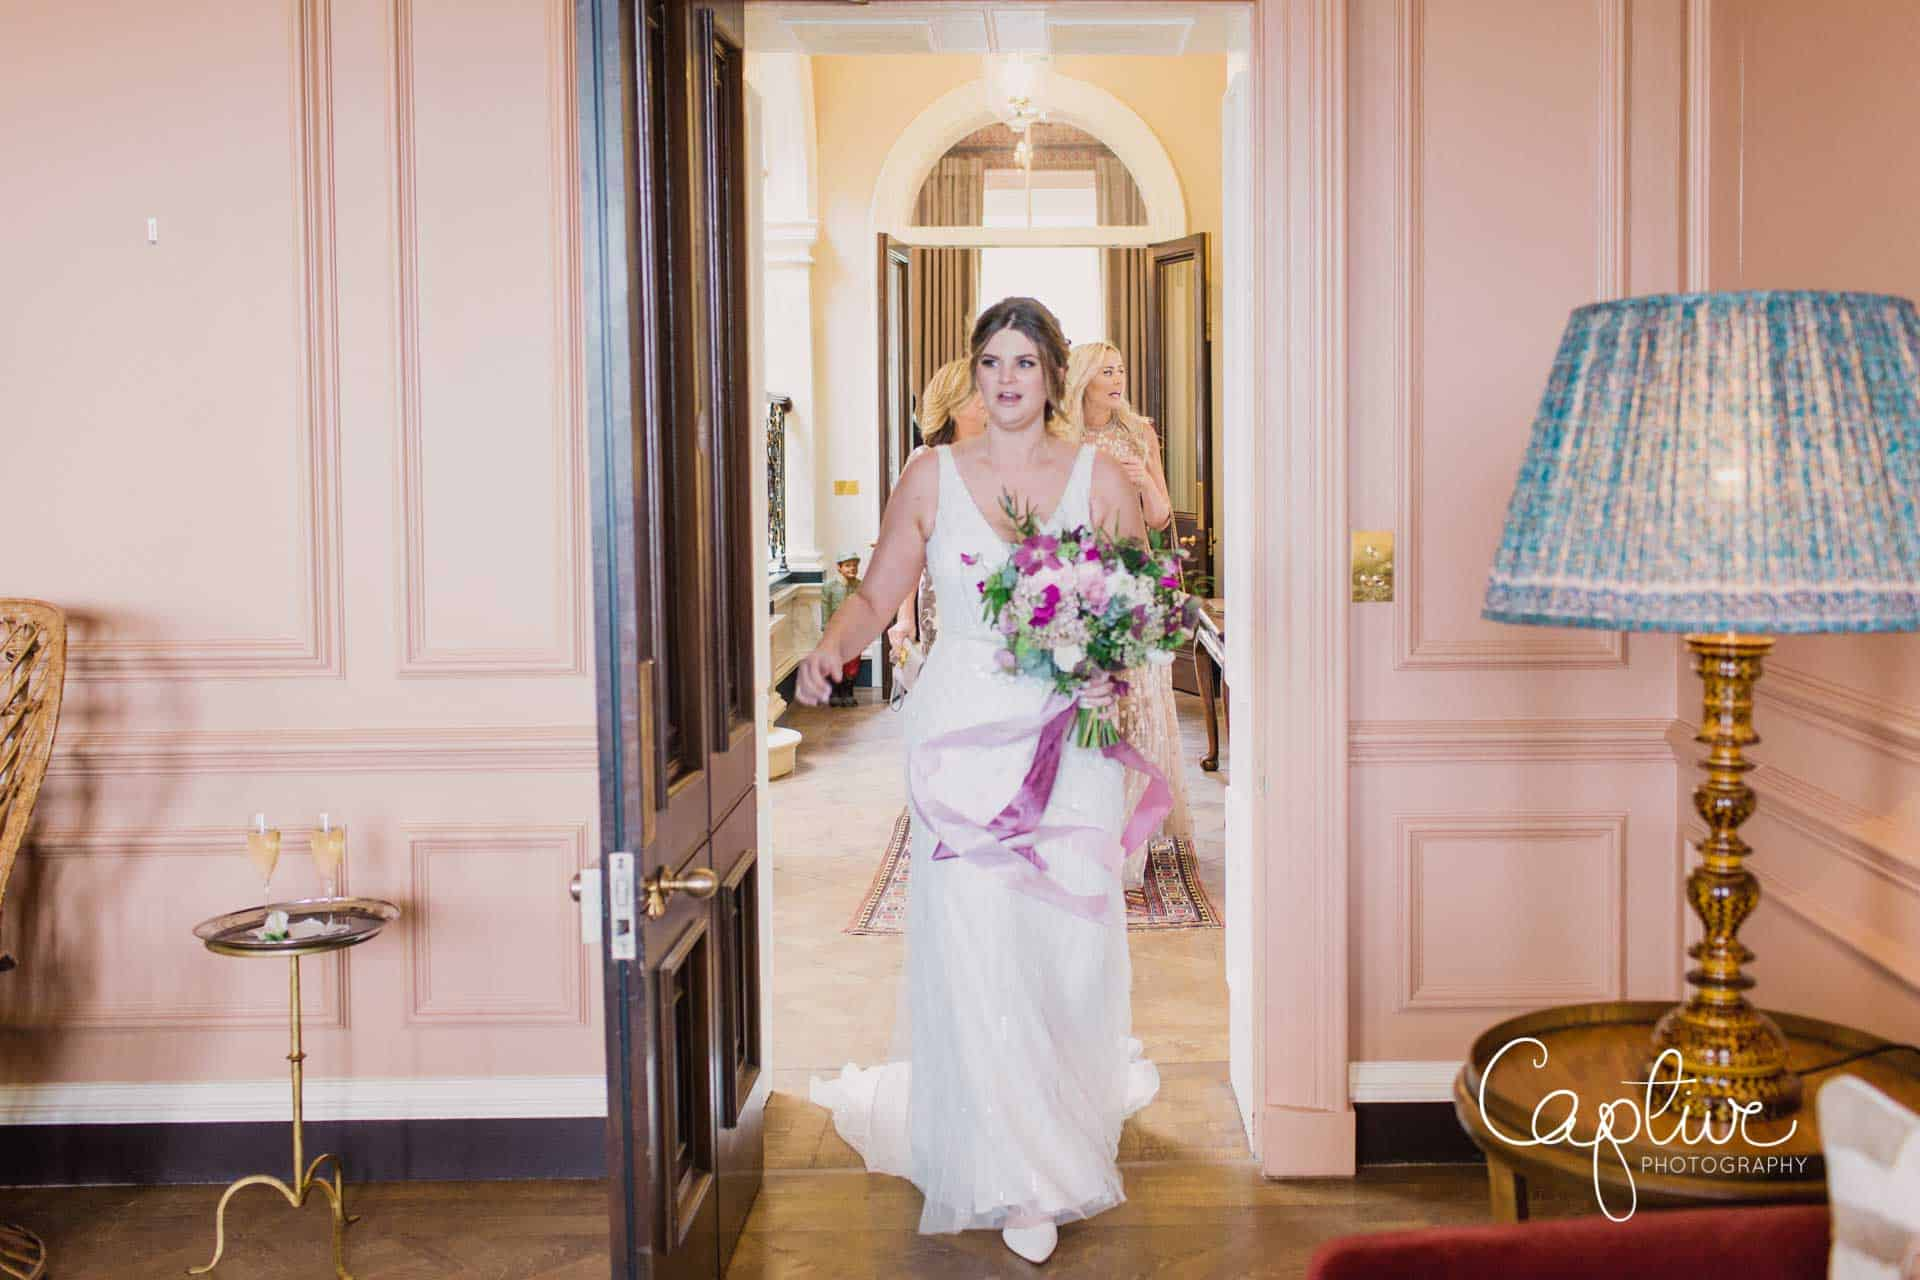 Beaverbrook Wedding Photographer by Surrey wedding photographer Jo Hughes